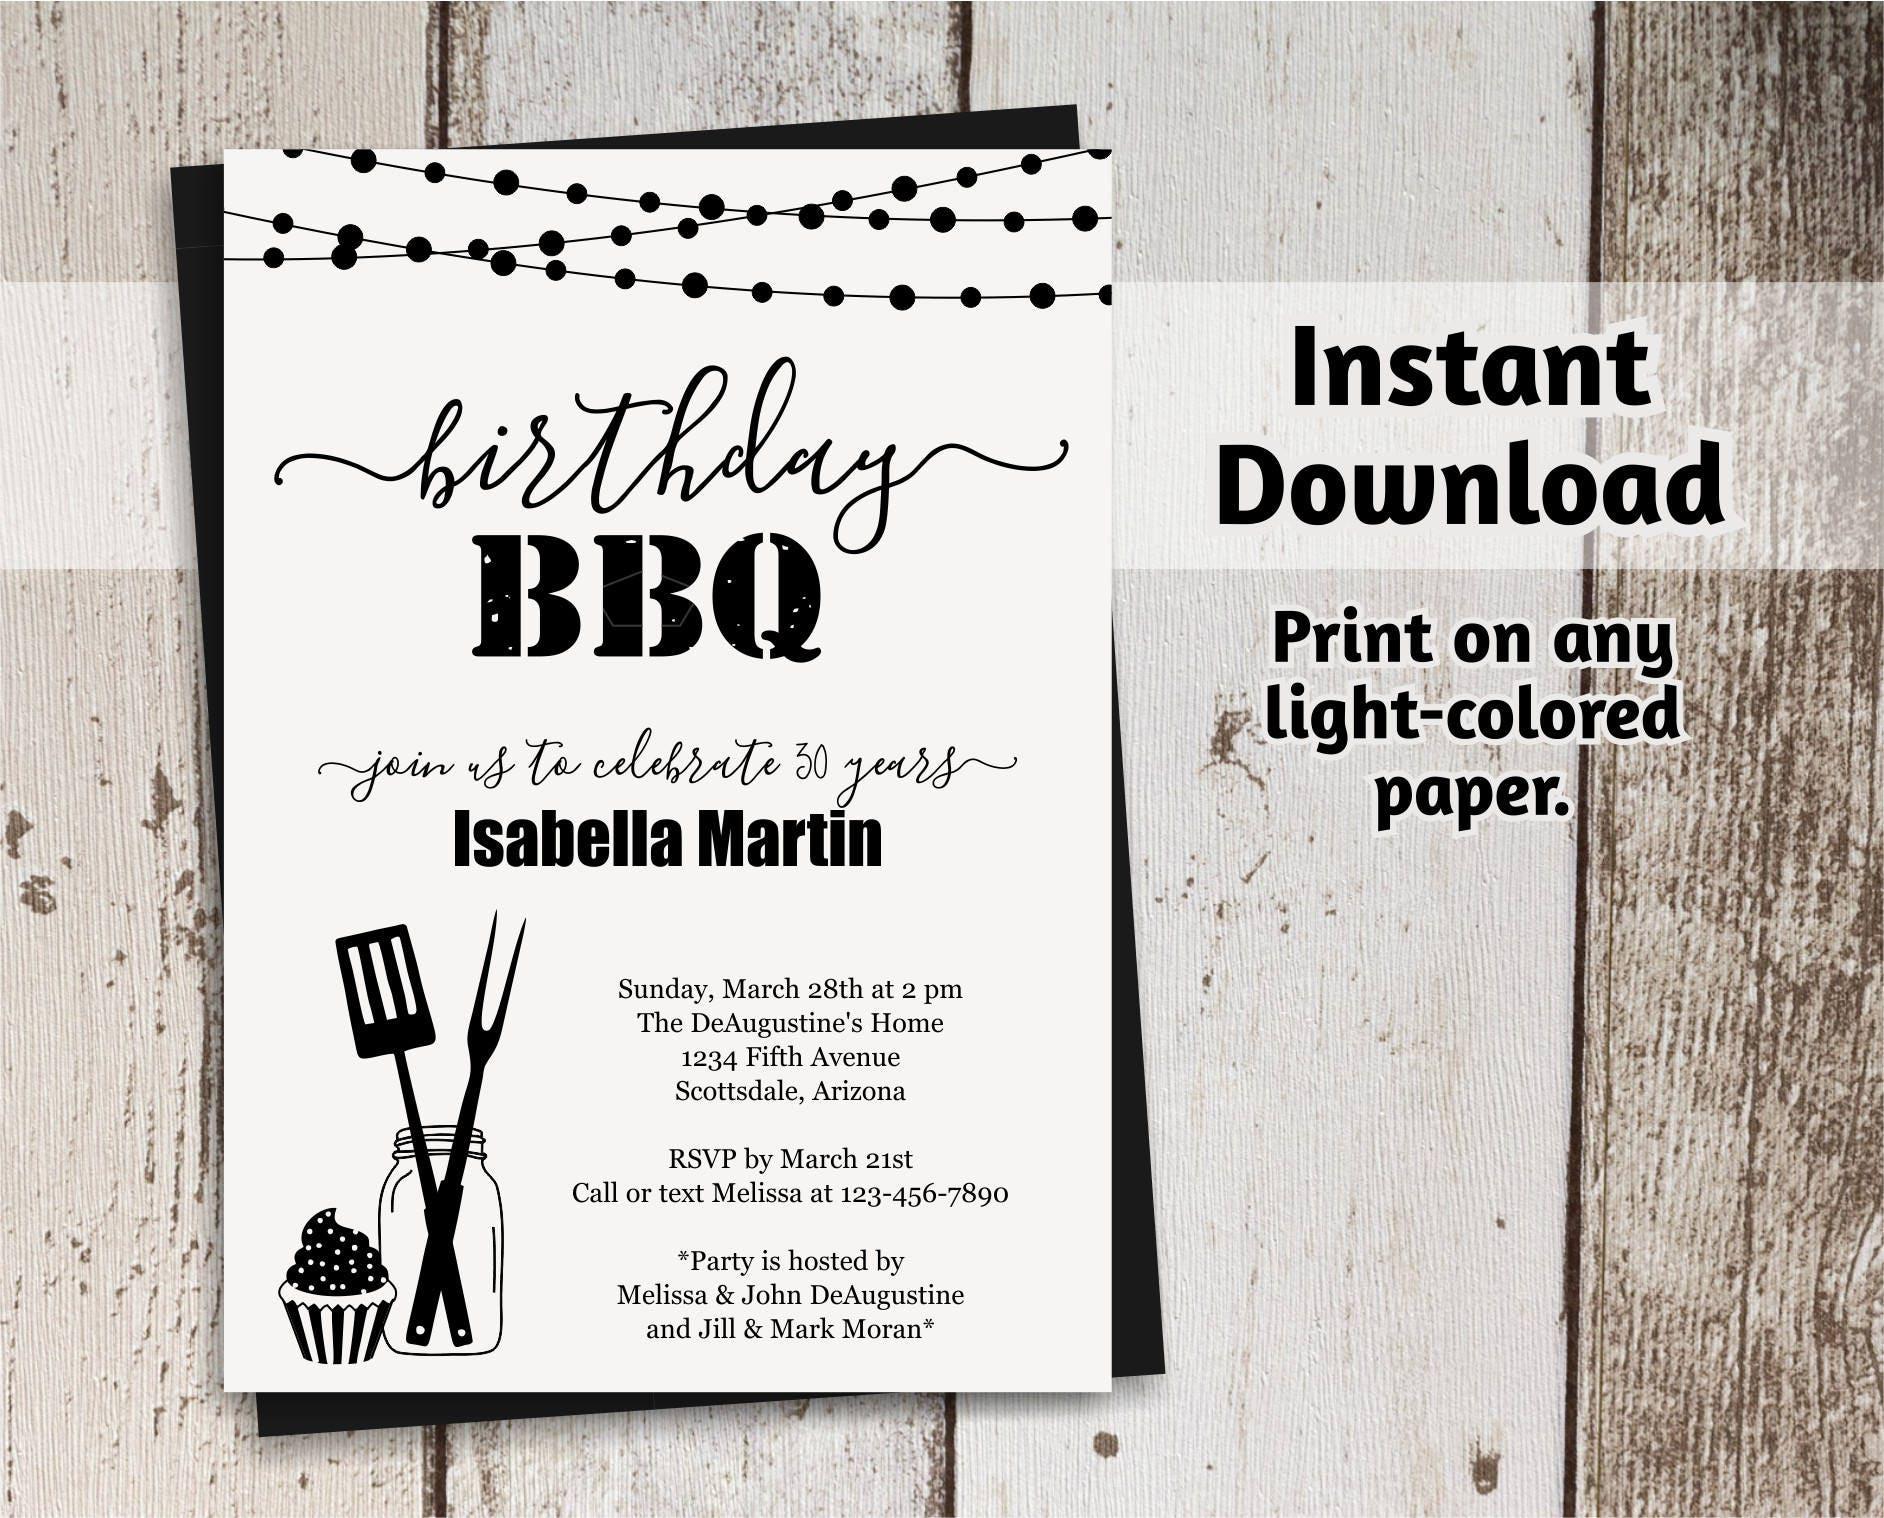 Birthday BBQ Invitation - Women / Men - Printable Barbeque Party ...